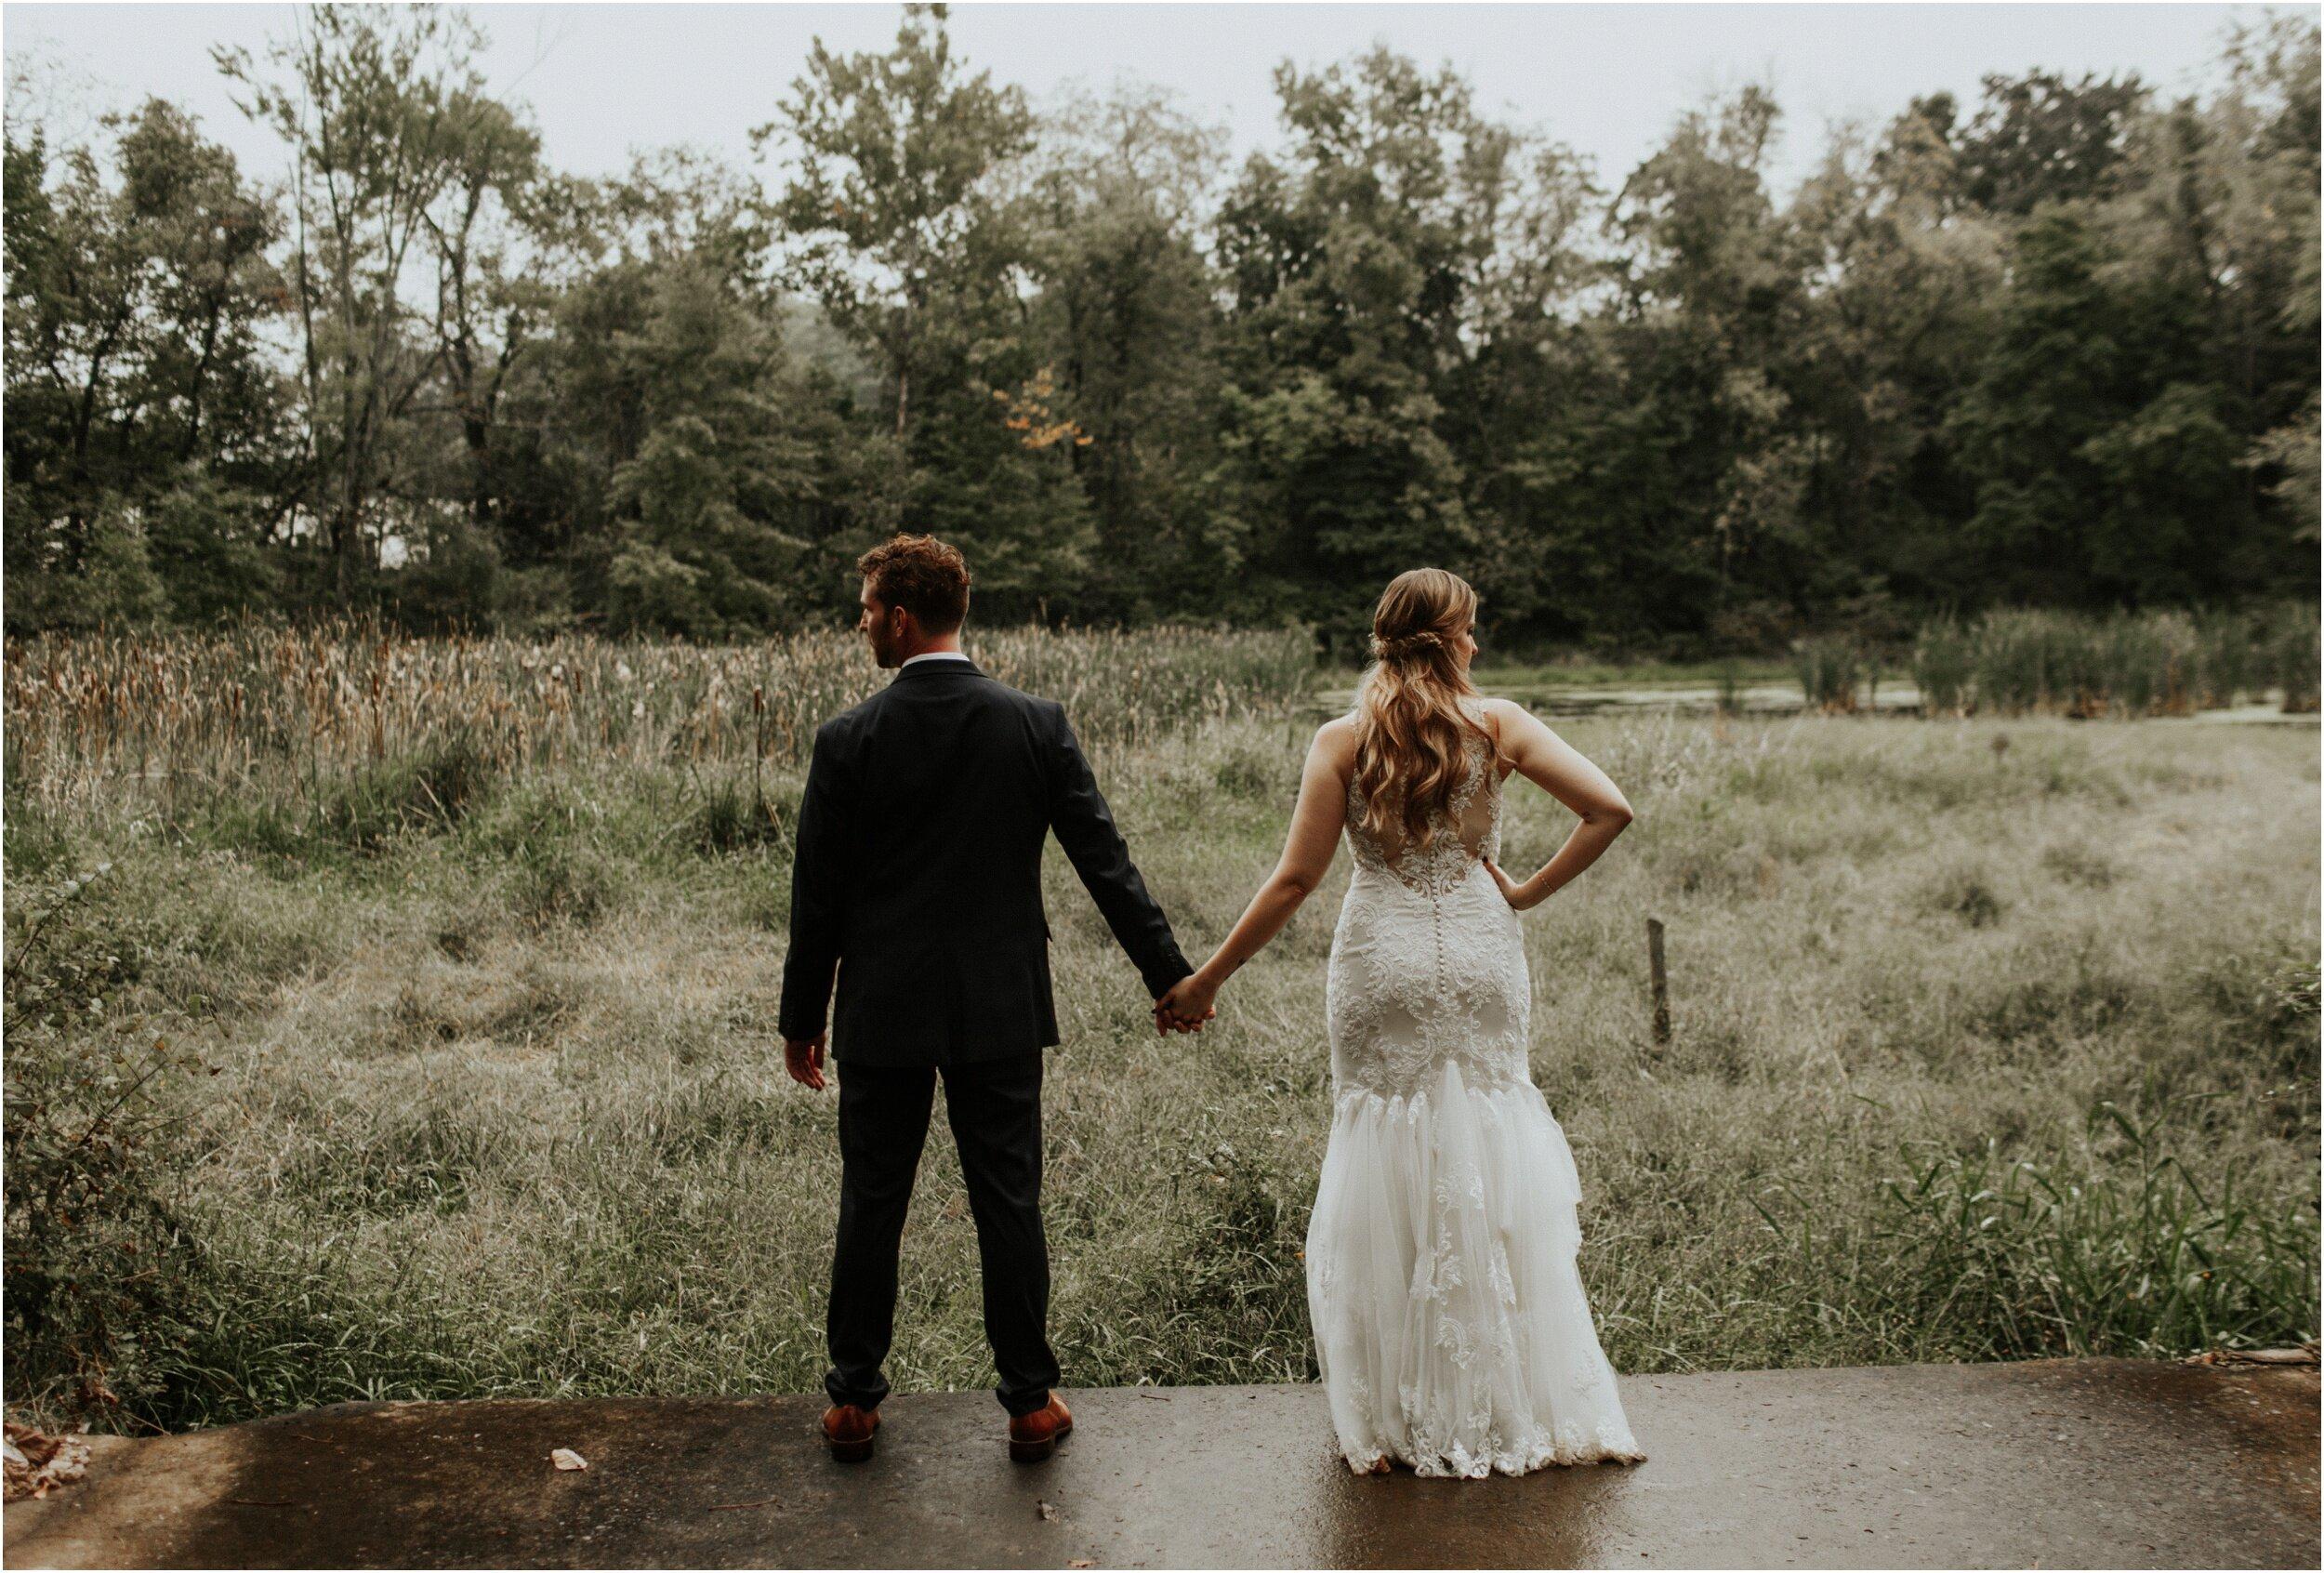 steph-and-jordan-cox-our-wedding-historic-shady-lane-compass-wedding-collective-hazel-lining-photography-destination-elopement-wedding-engagement-photography_0068.jpg